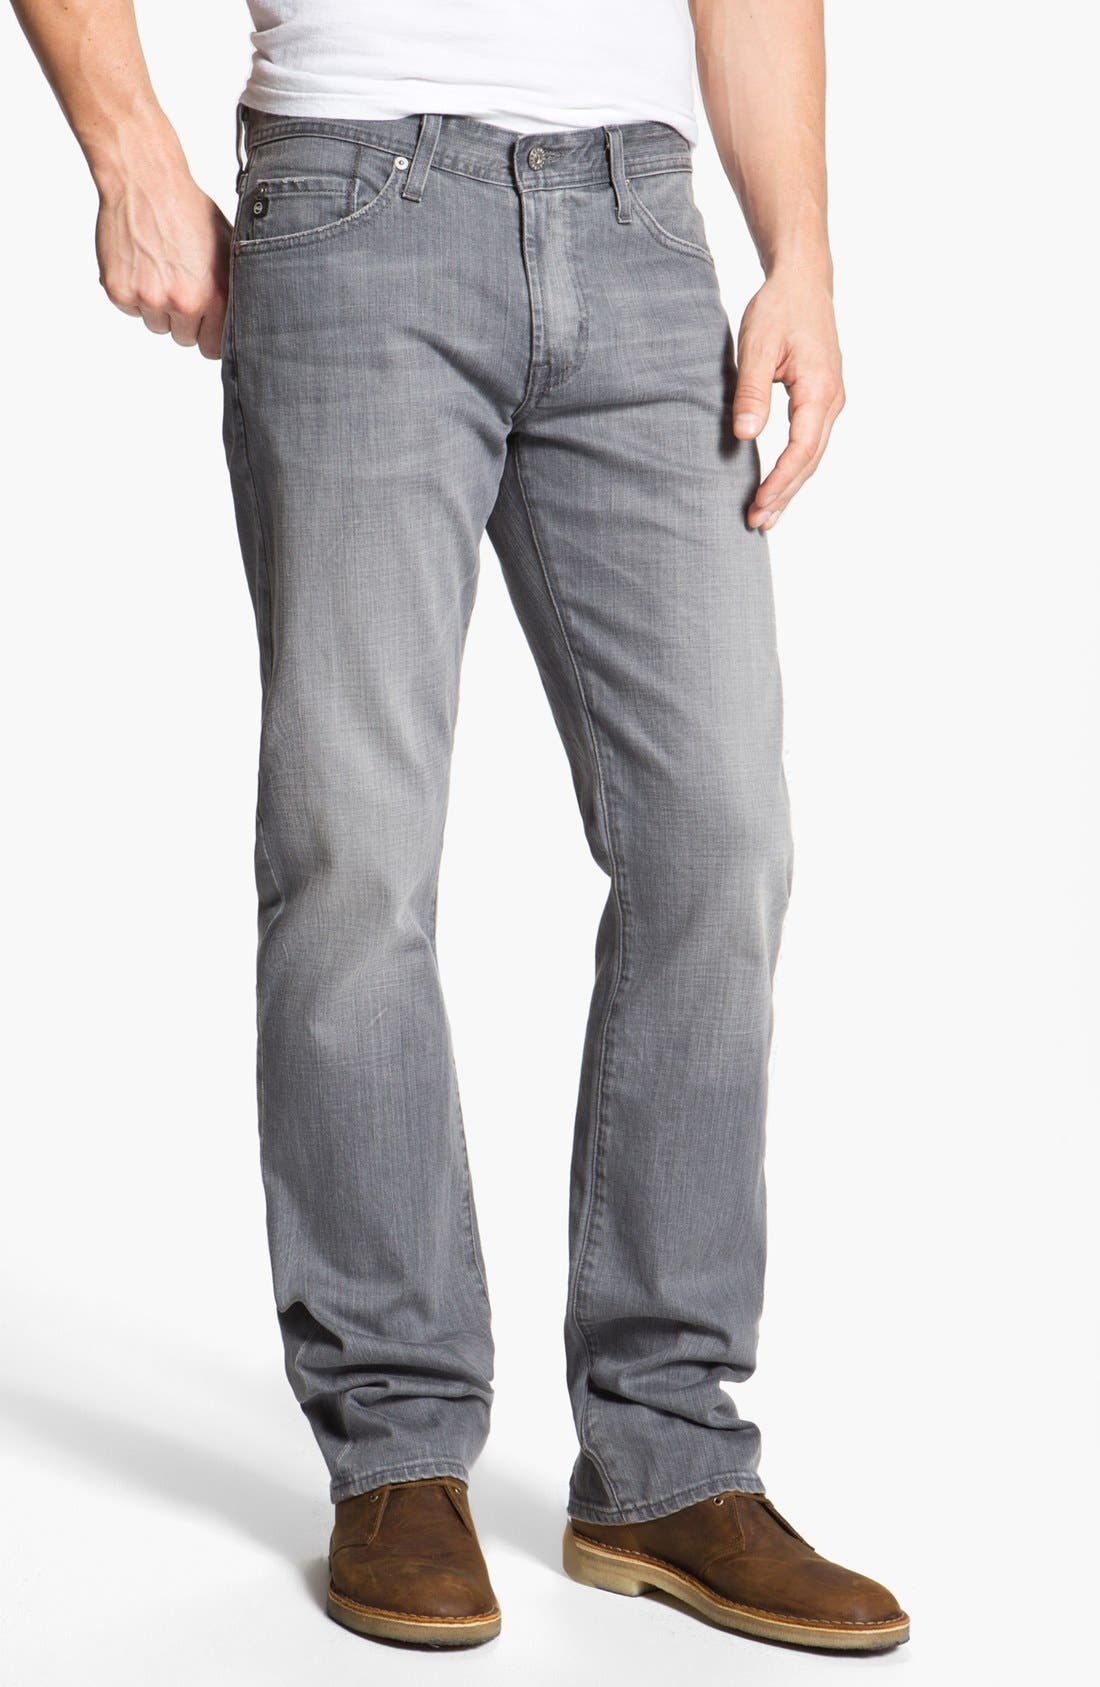 Alternate Image 1 Selected - AG 'Protégé' Straight Leg Jeans (Malt)